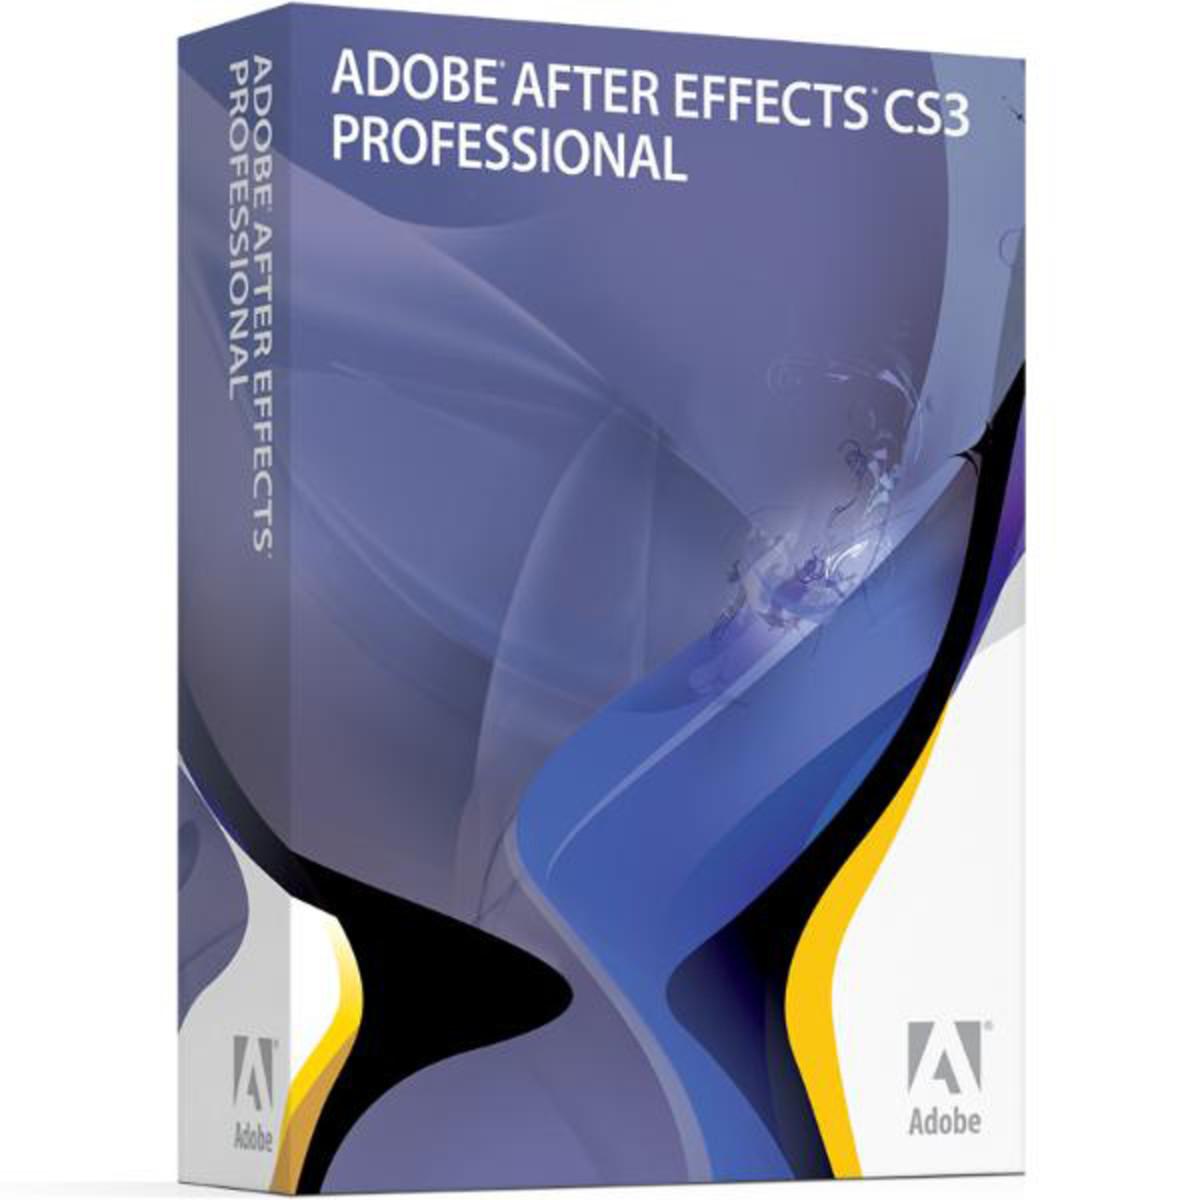 Adobe after effects cs3 professional keygen 8.0.2 update